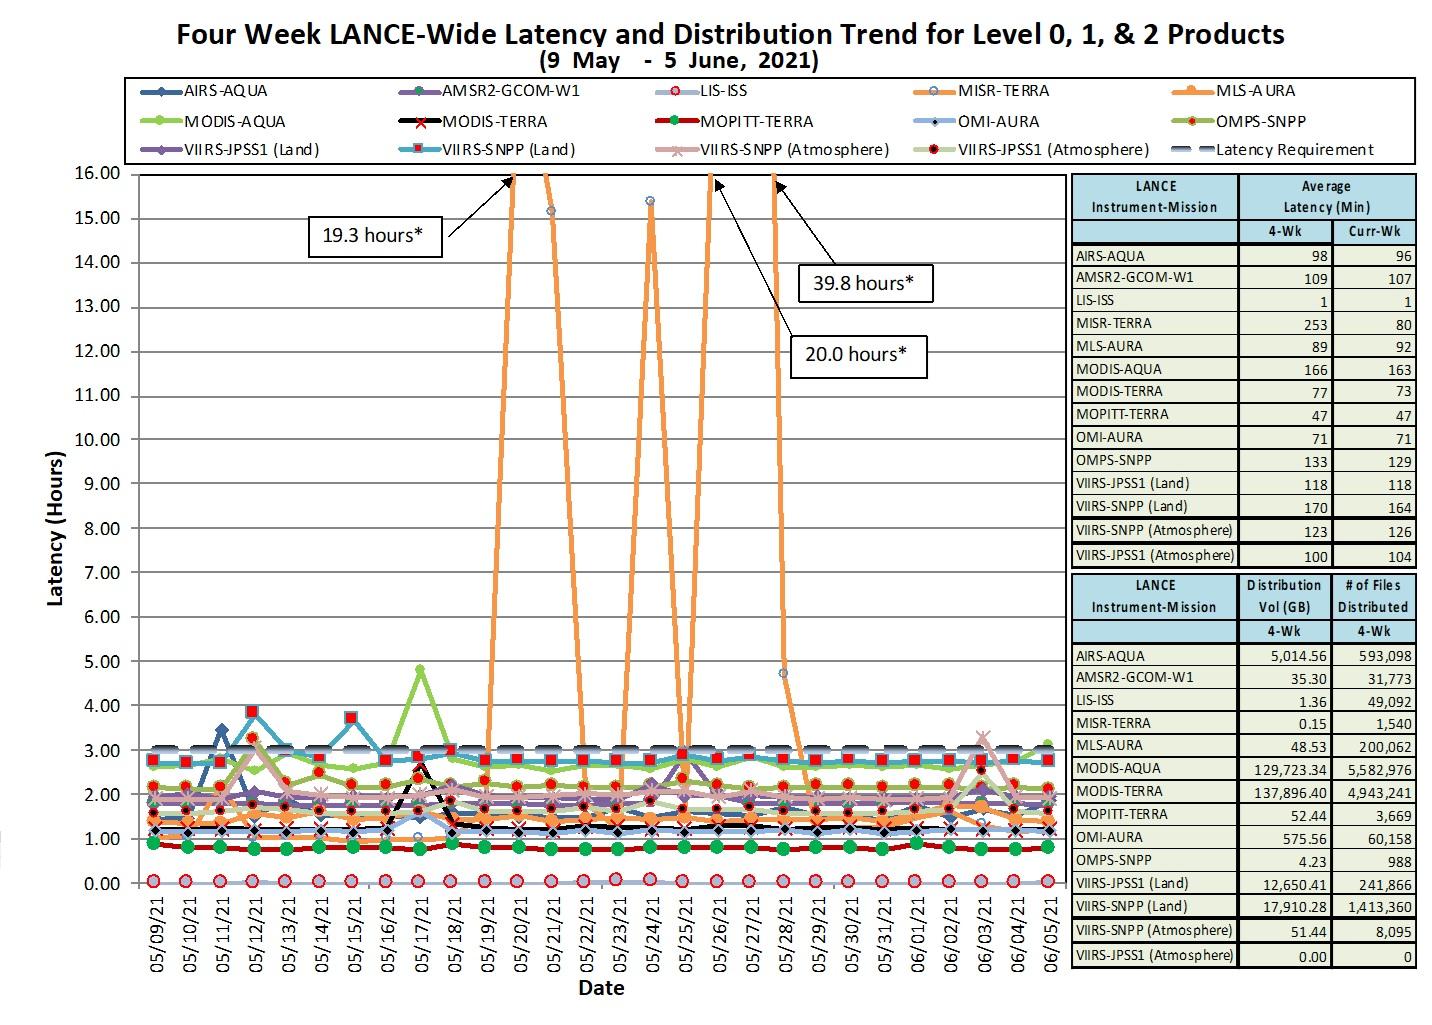 LANCE Metrics 1 1-14-21